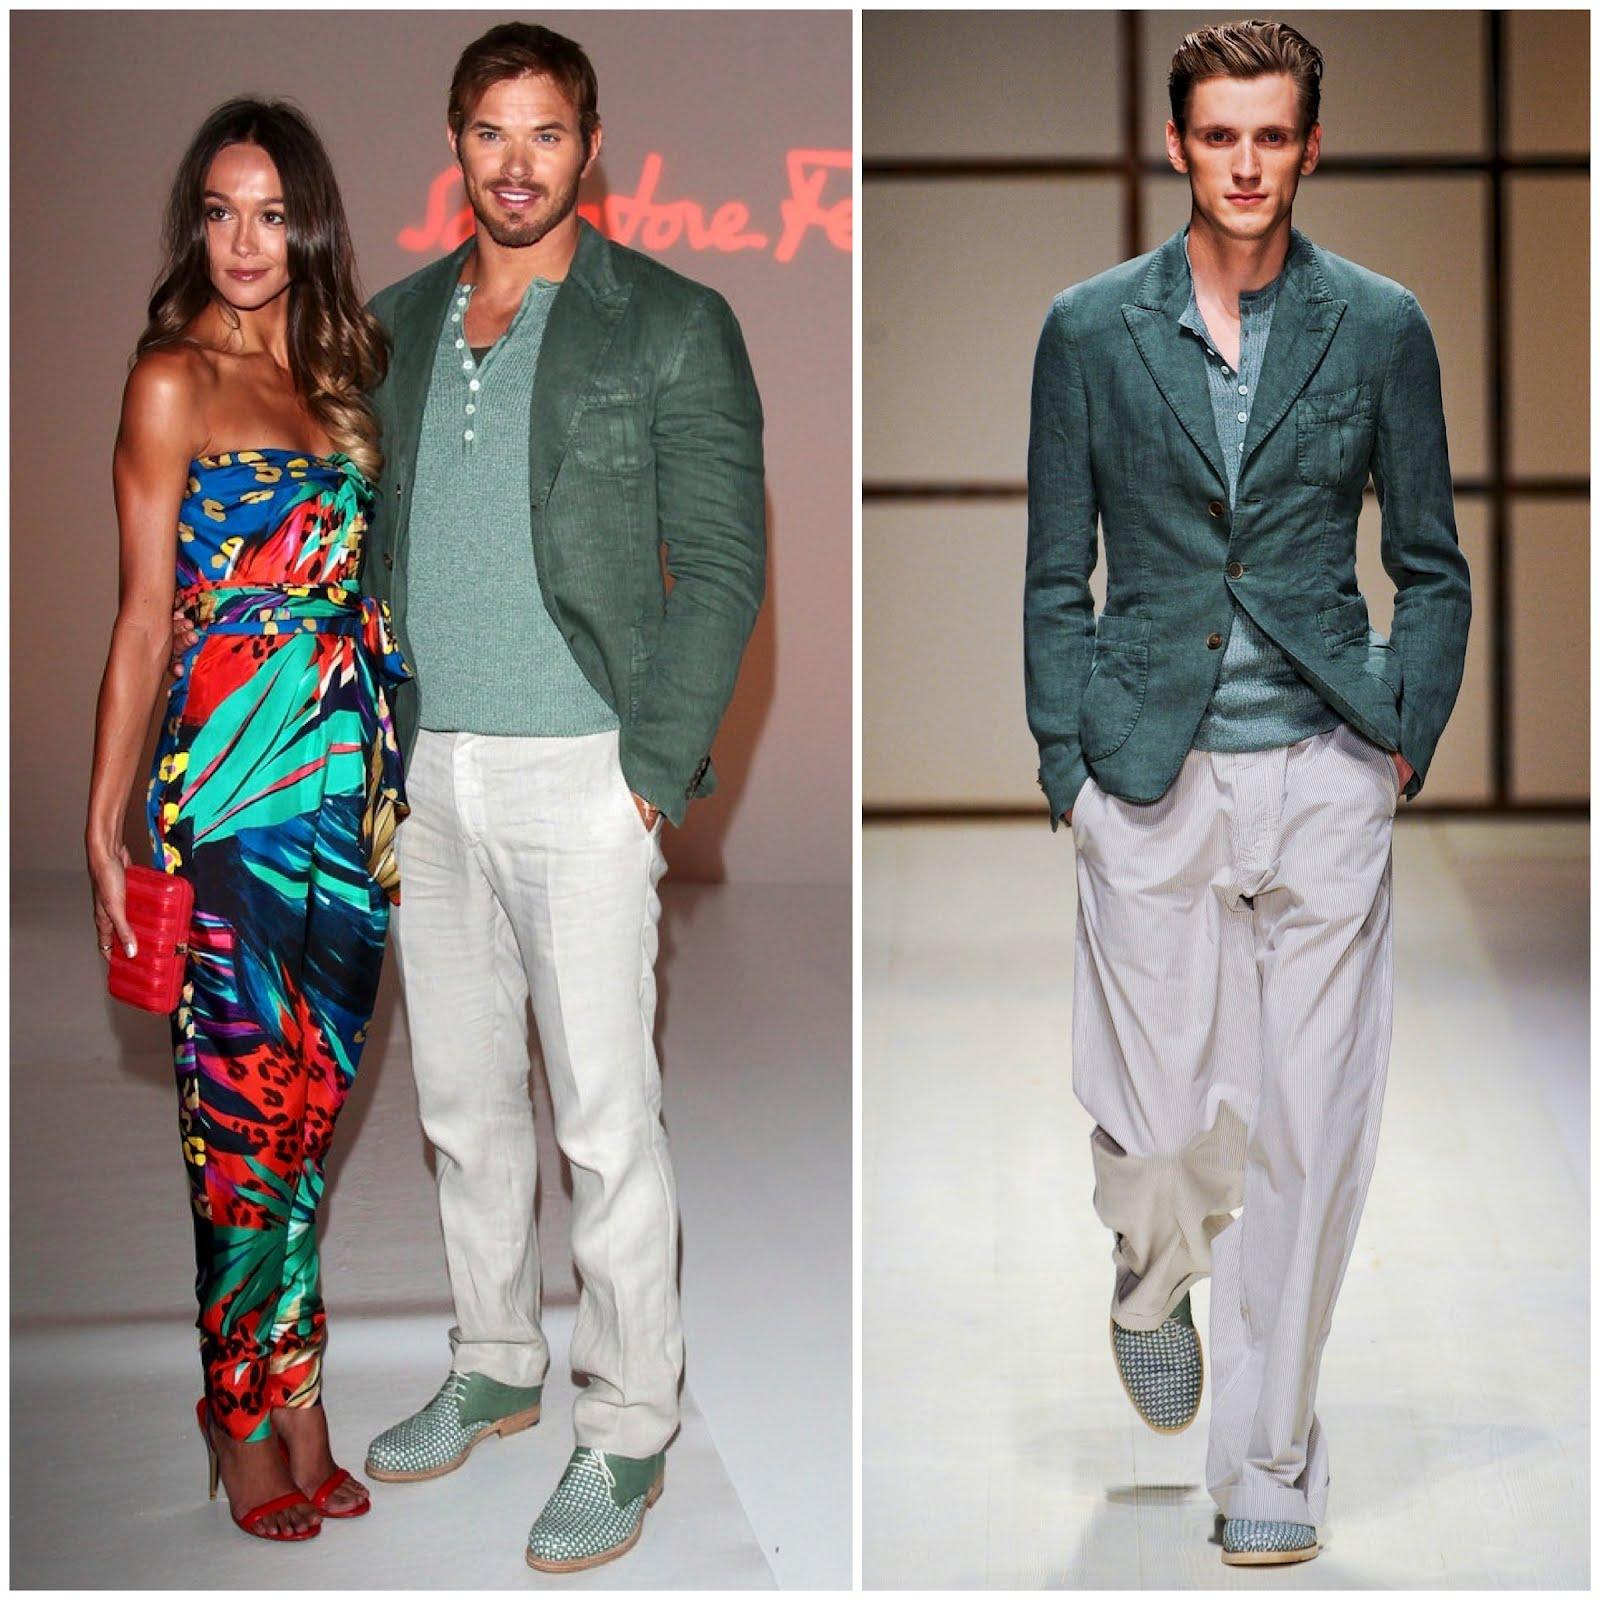 00o00 menswear london blog salvatore ferragamo Spring summer 2013 SS2013 milan fashion week Kellan Lutz